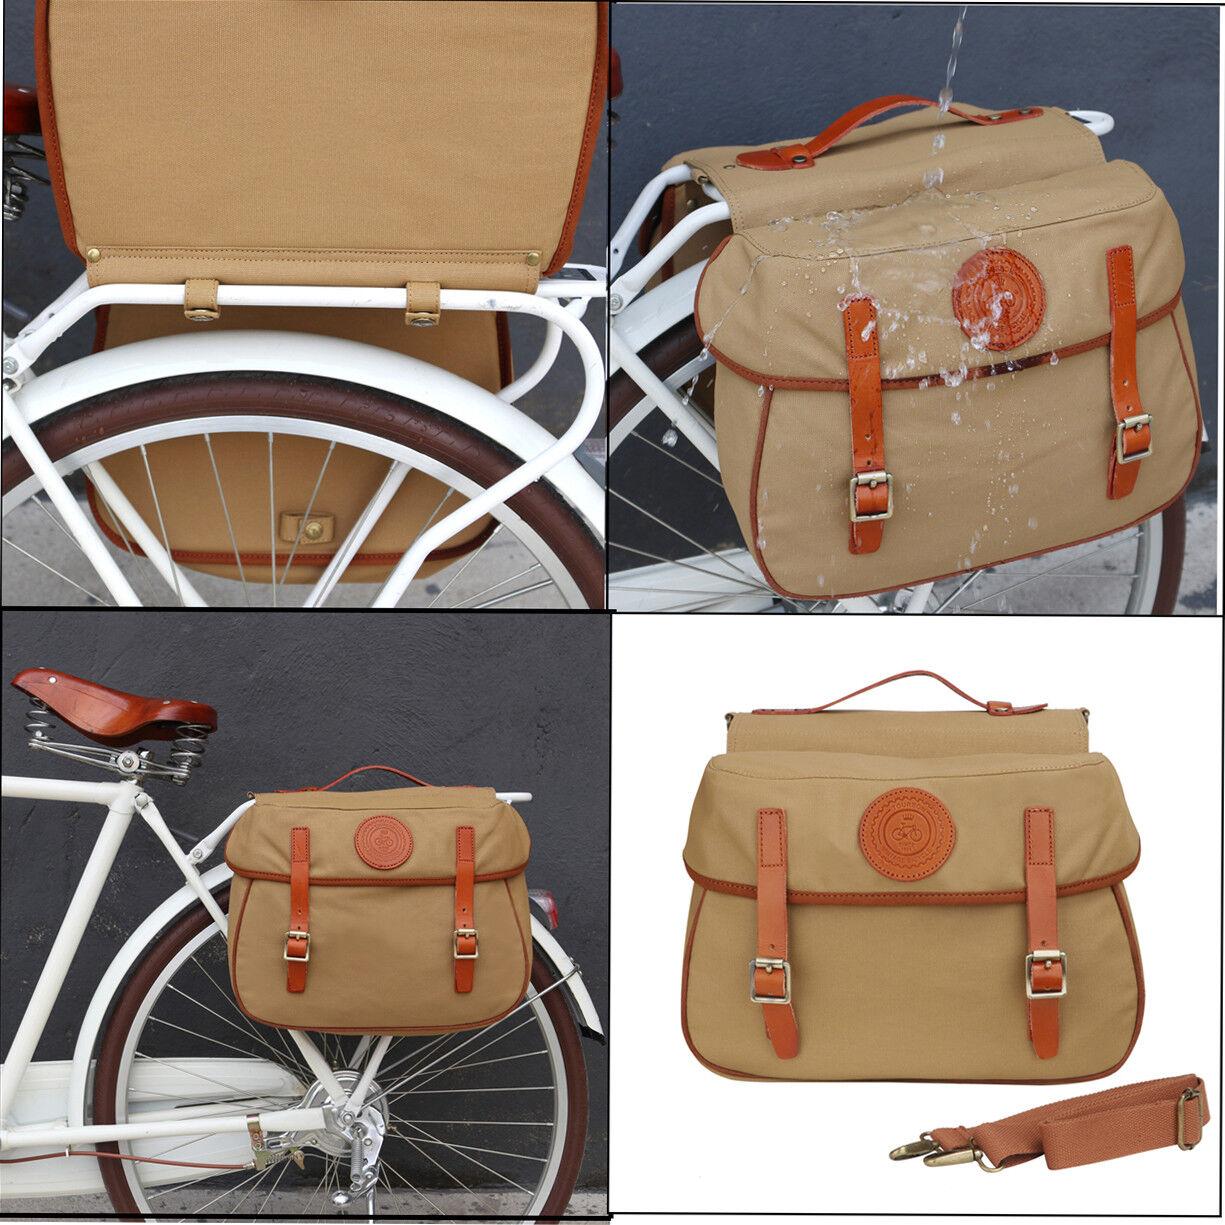 Tourbon Bicicleta Ciclismo Alforja Doble Bolsa Portaequipajes Trasero Impermeable De Lona de viaje de tronco